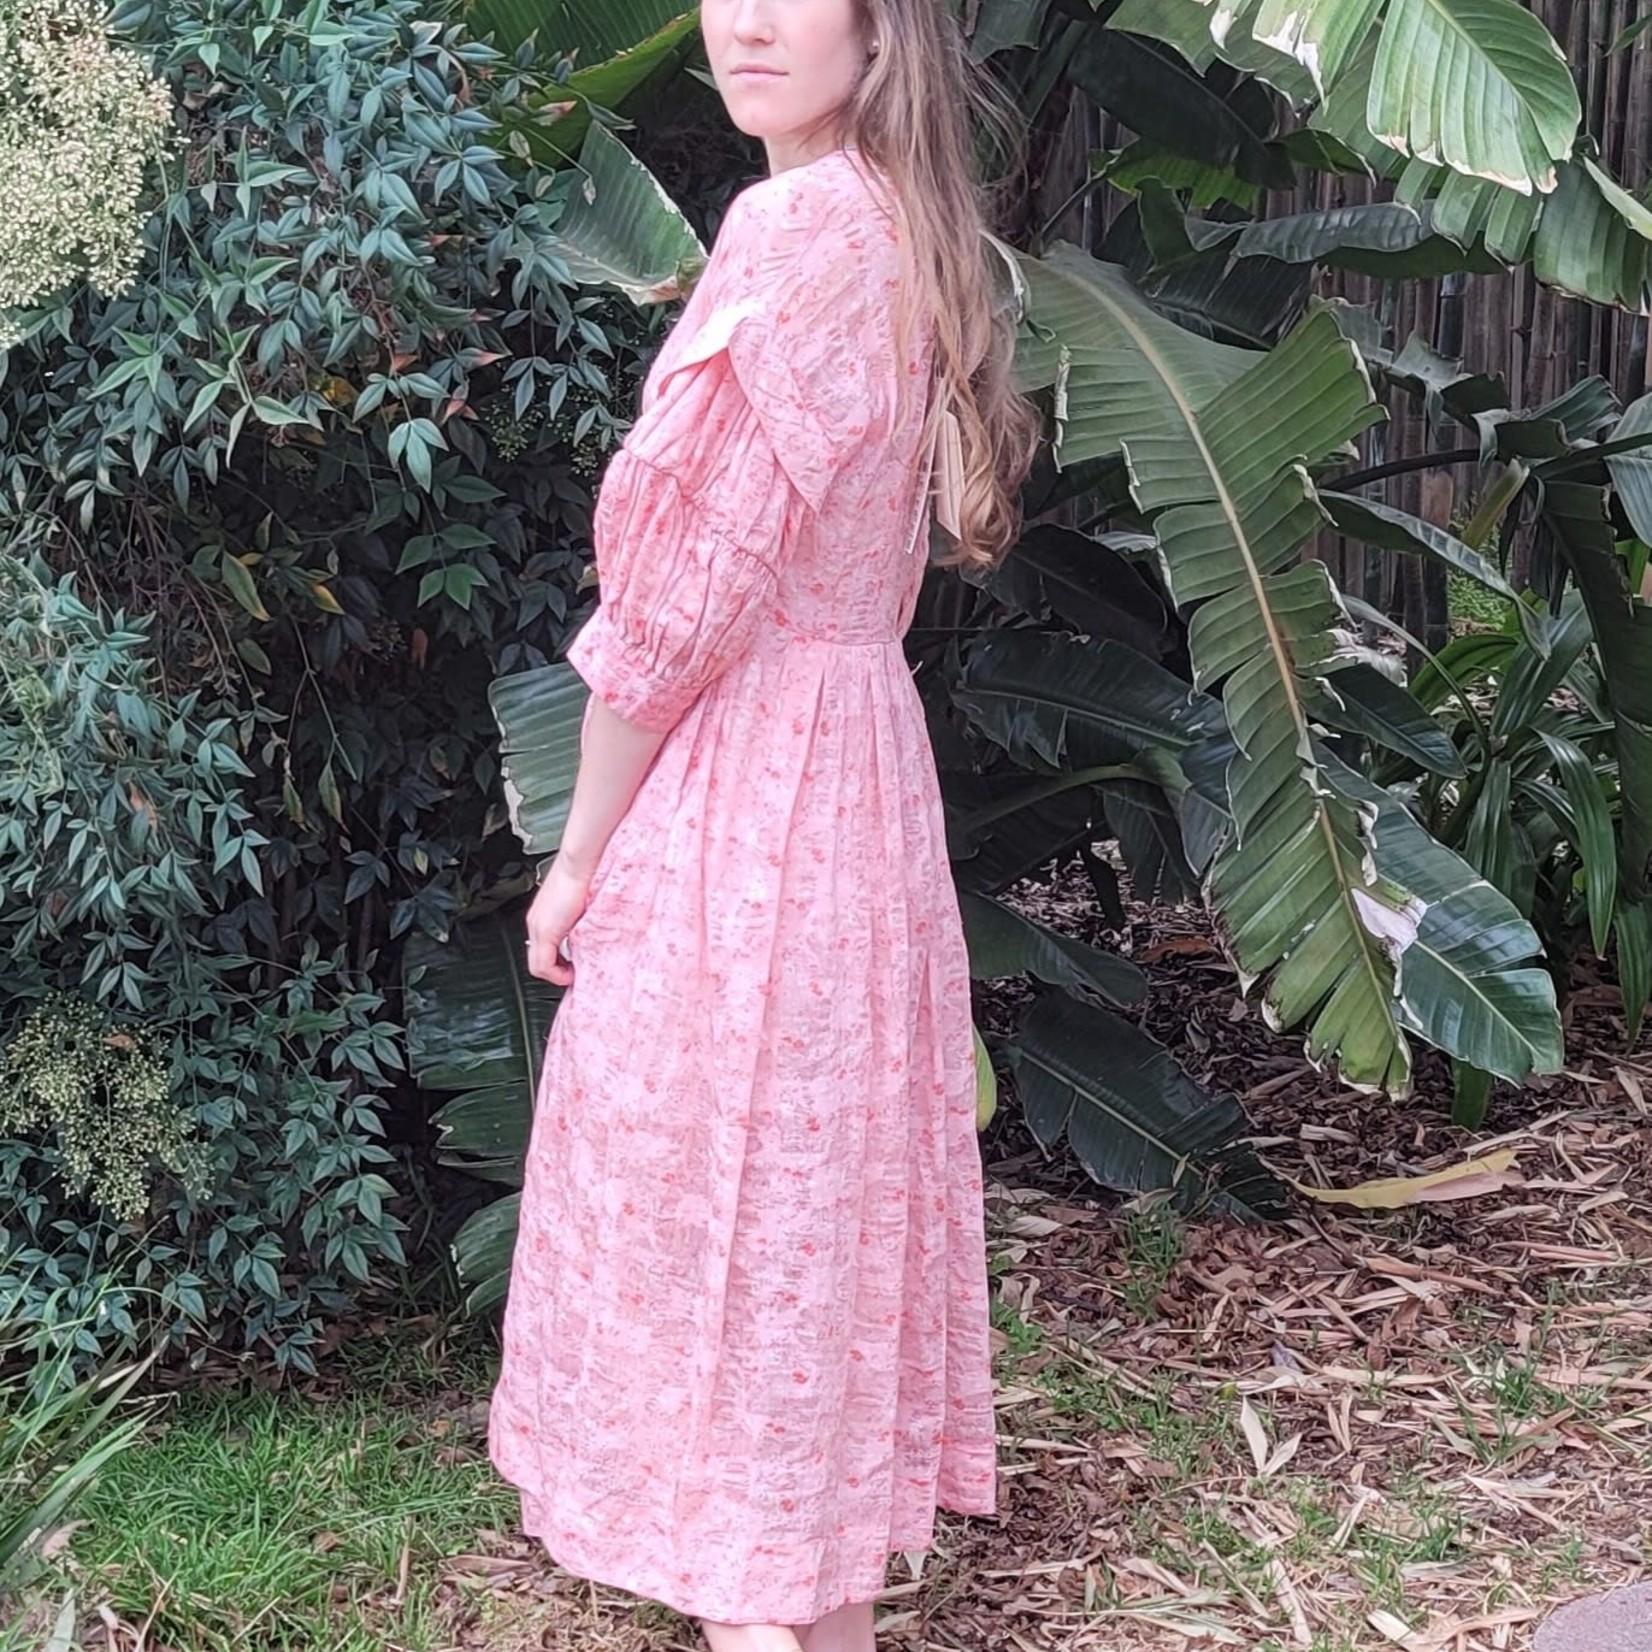 Renlu Su Renli Su Pink Dress